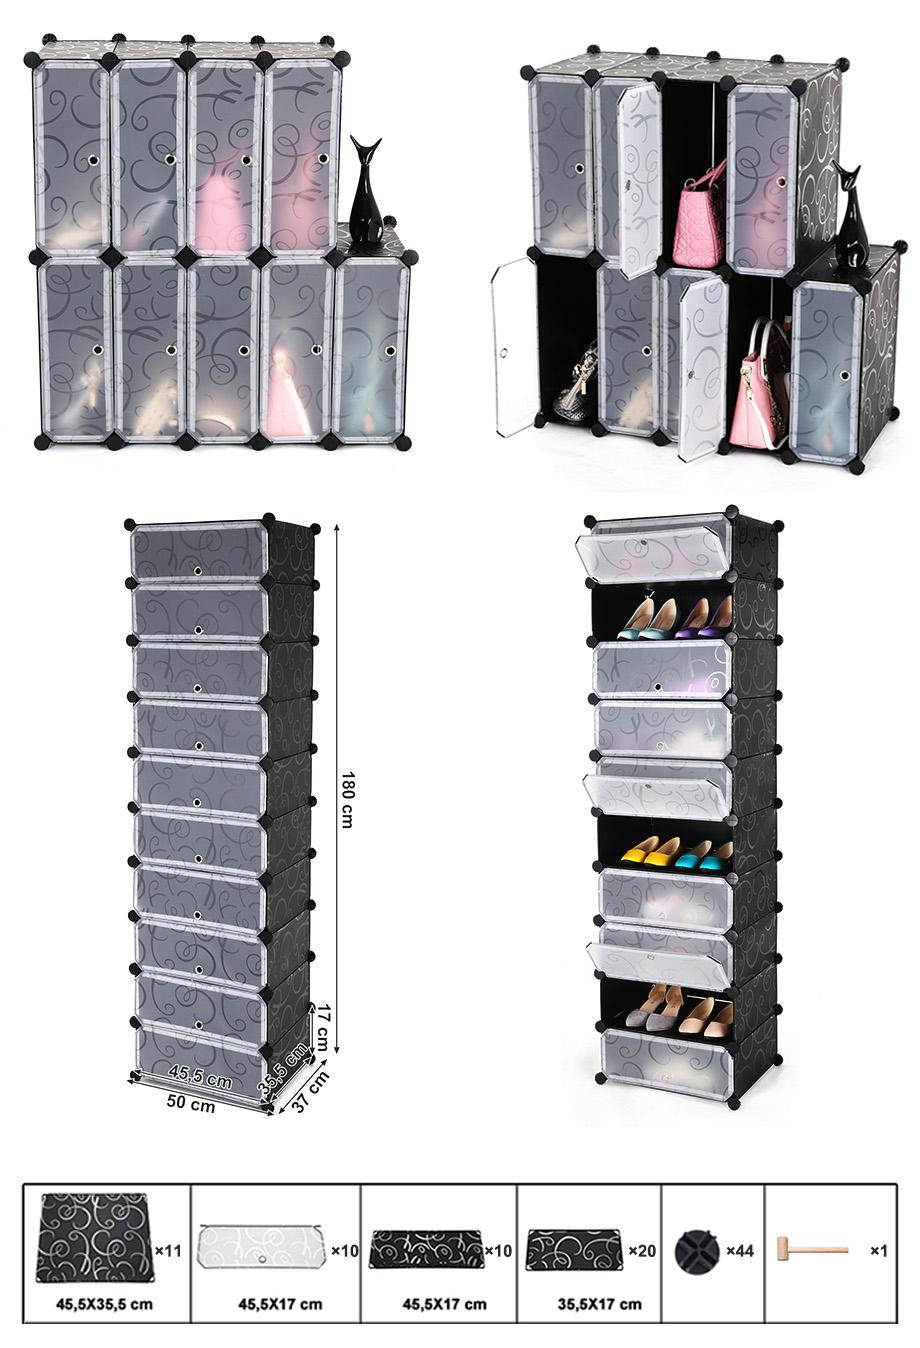 diy regalsystem schuhregal steckregal schrank schuhablage schwarz lpc10h ebay. Black Bedroom Furniture Sets. Home Design Ideas